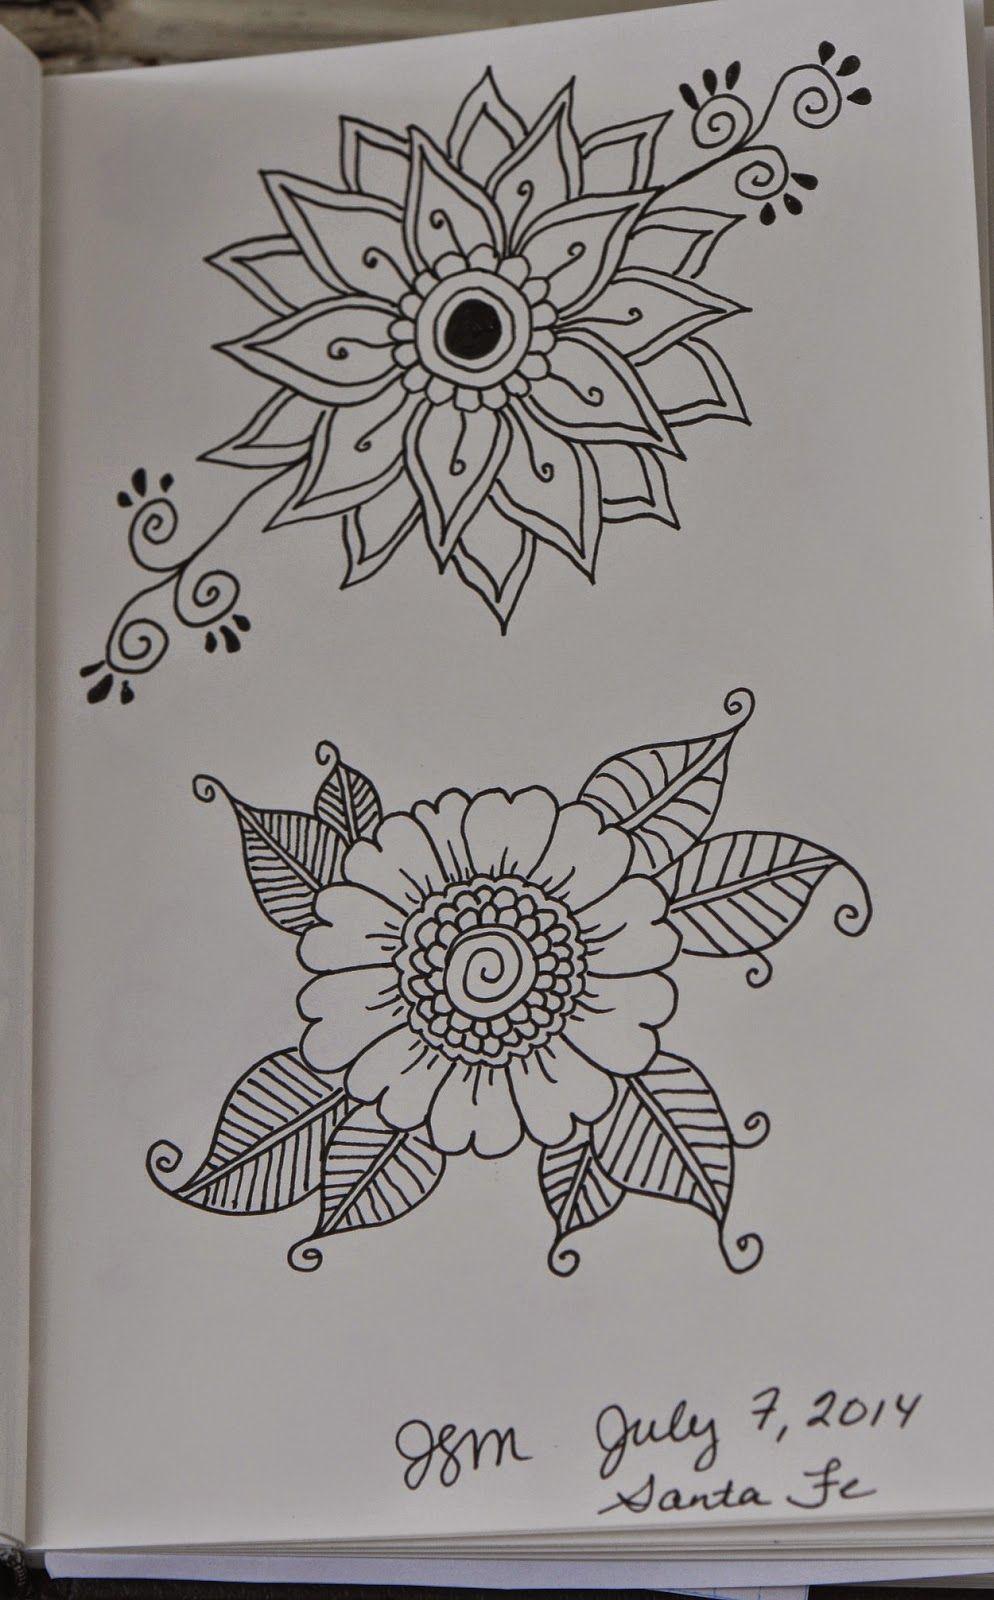 Flower Doodles frieda louise   Embroidery   Pinterest ...